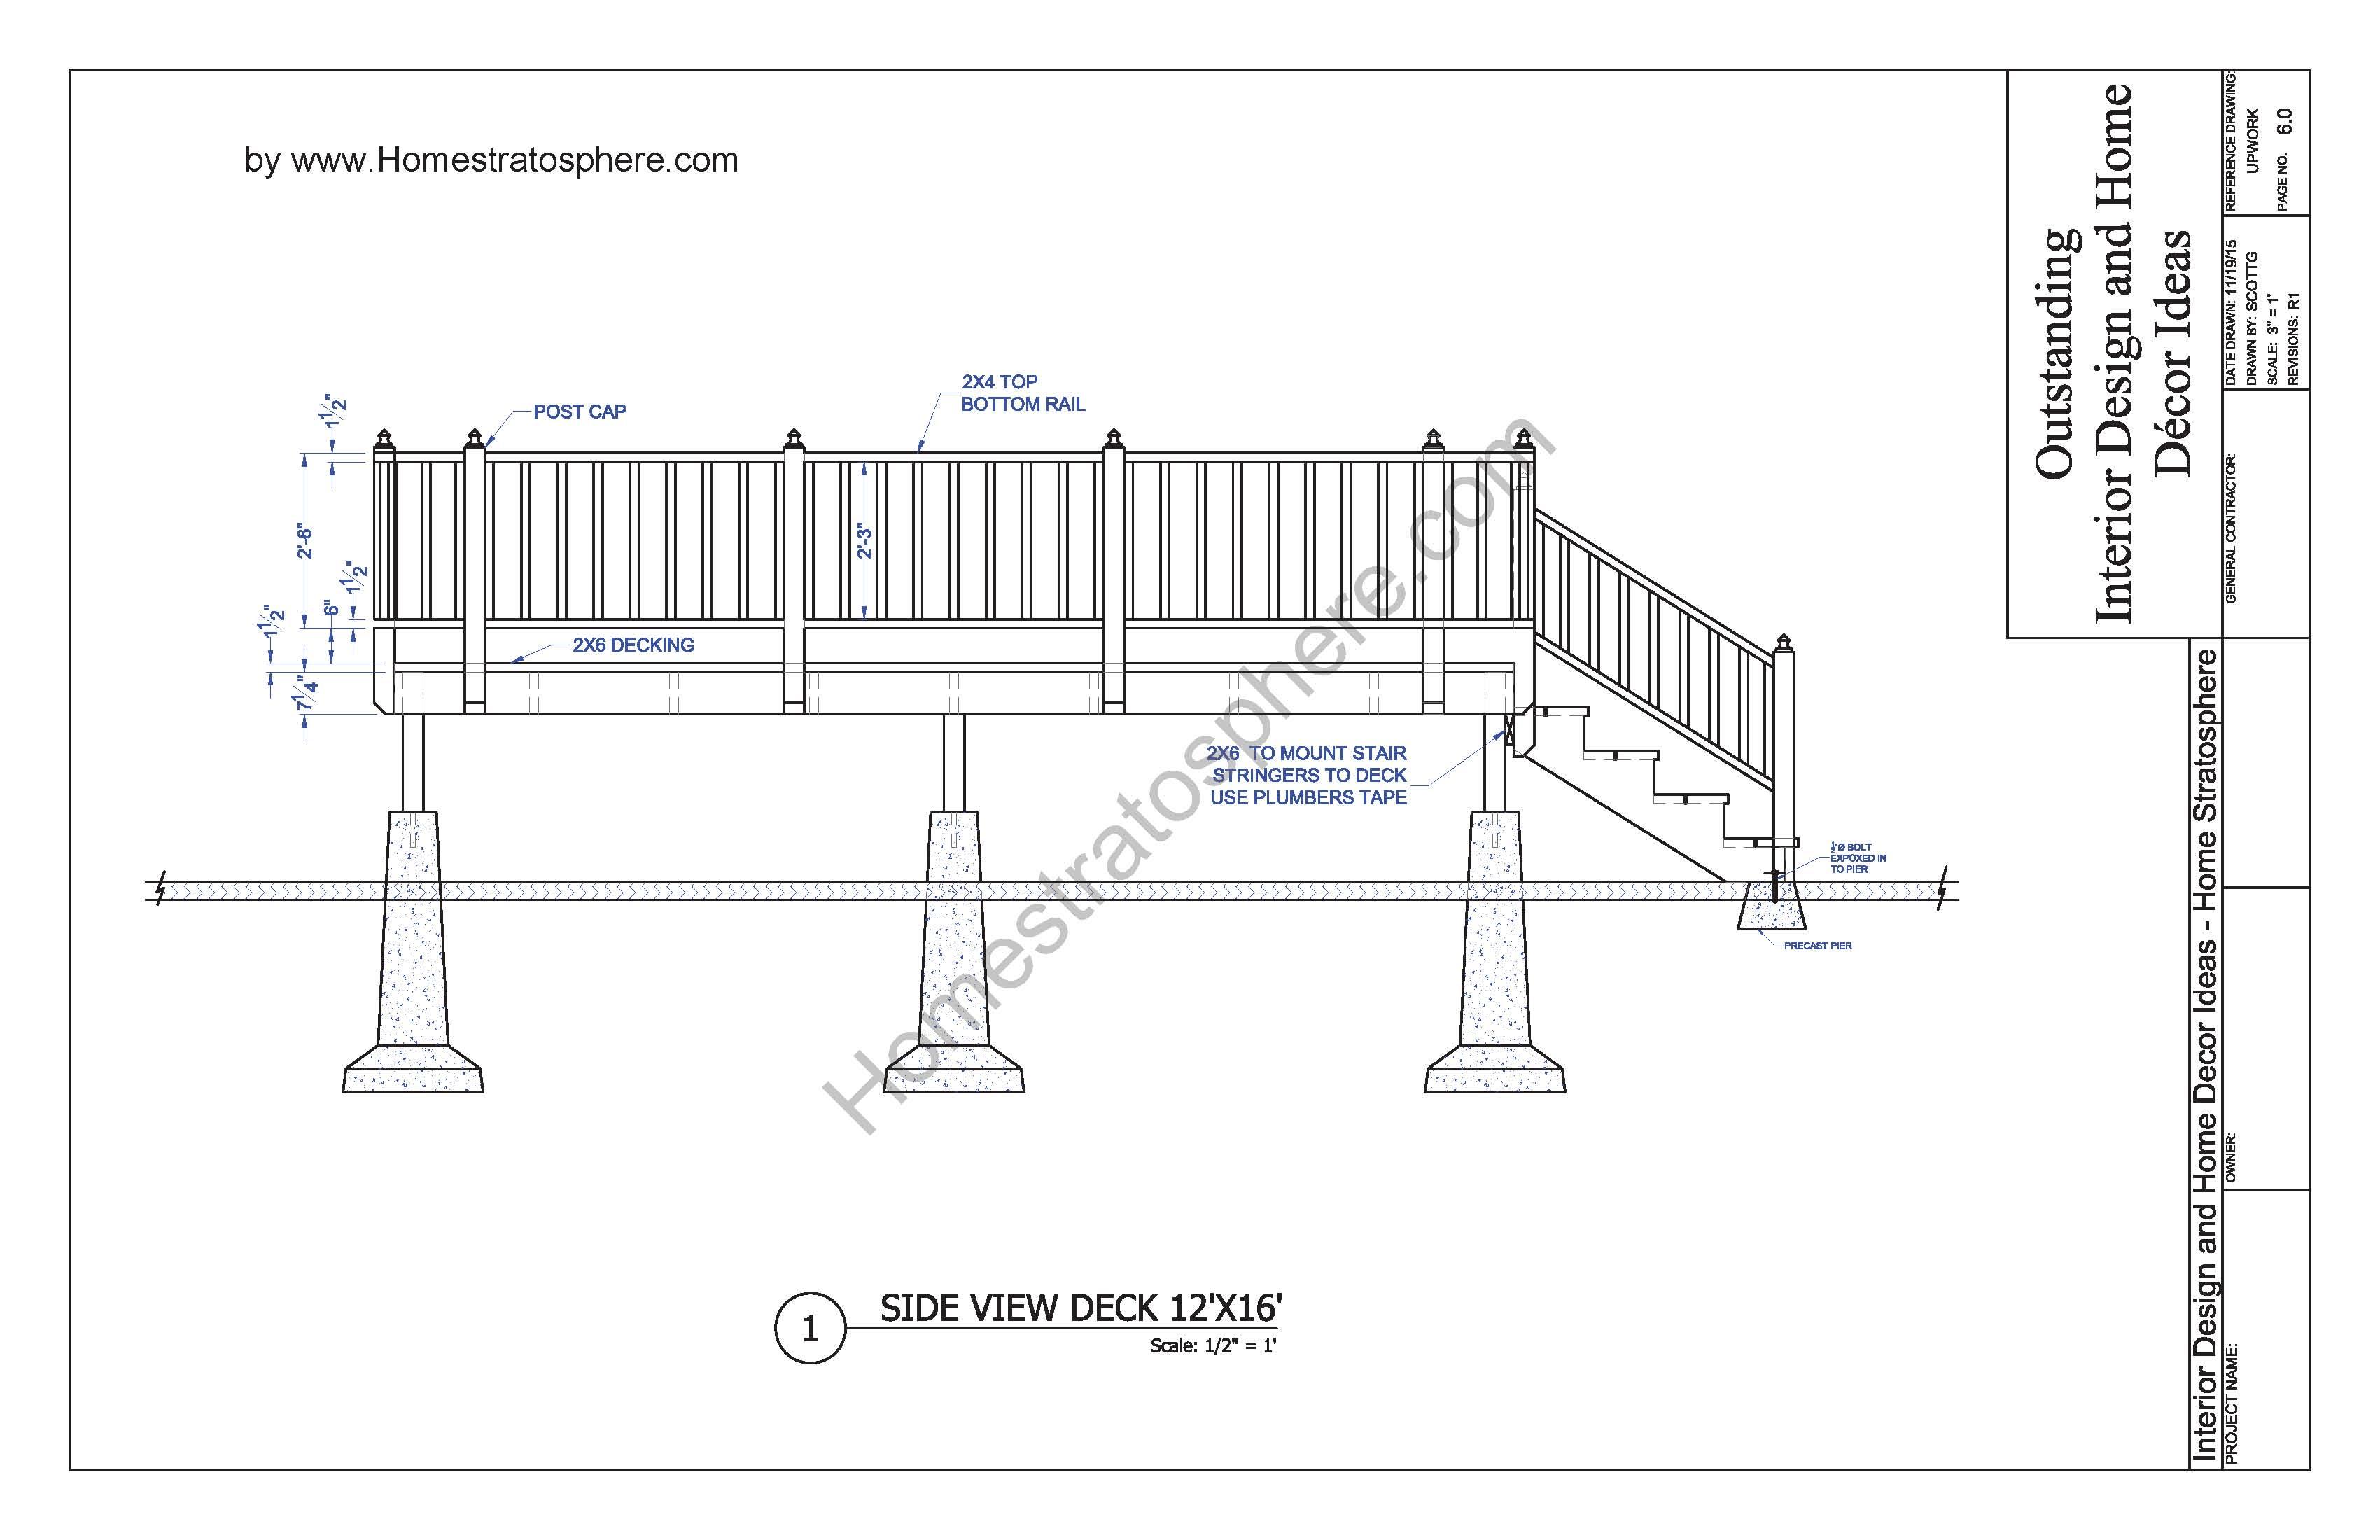 stair railing parts diagram john deere free 12' x 16' deck plan blueprint (with pdf document download)